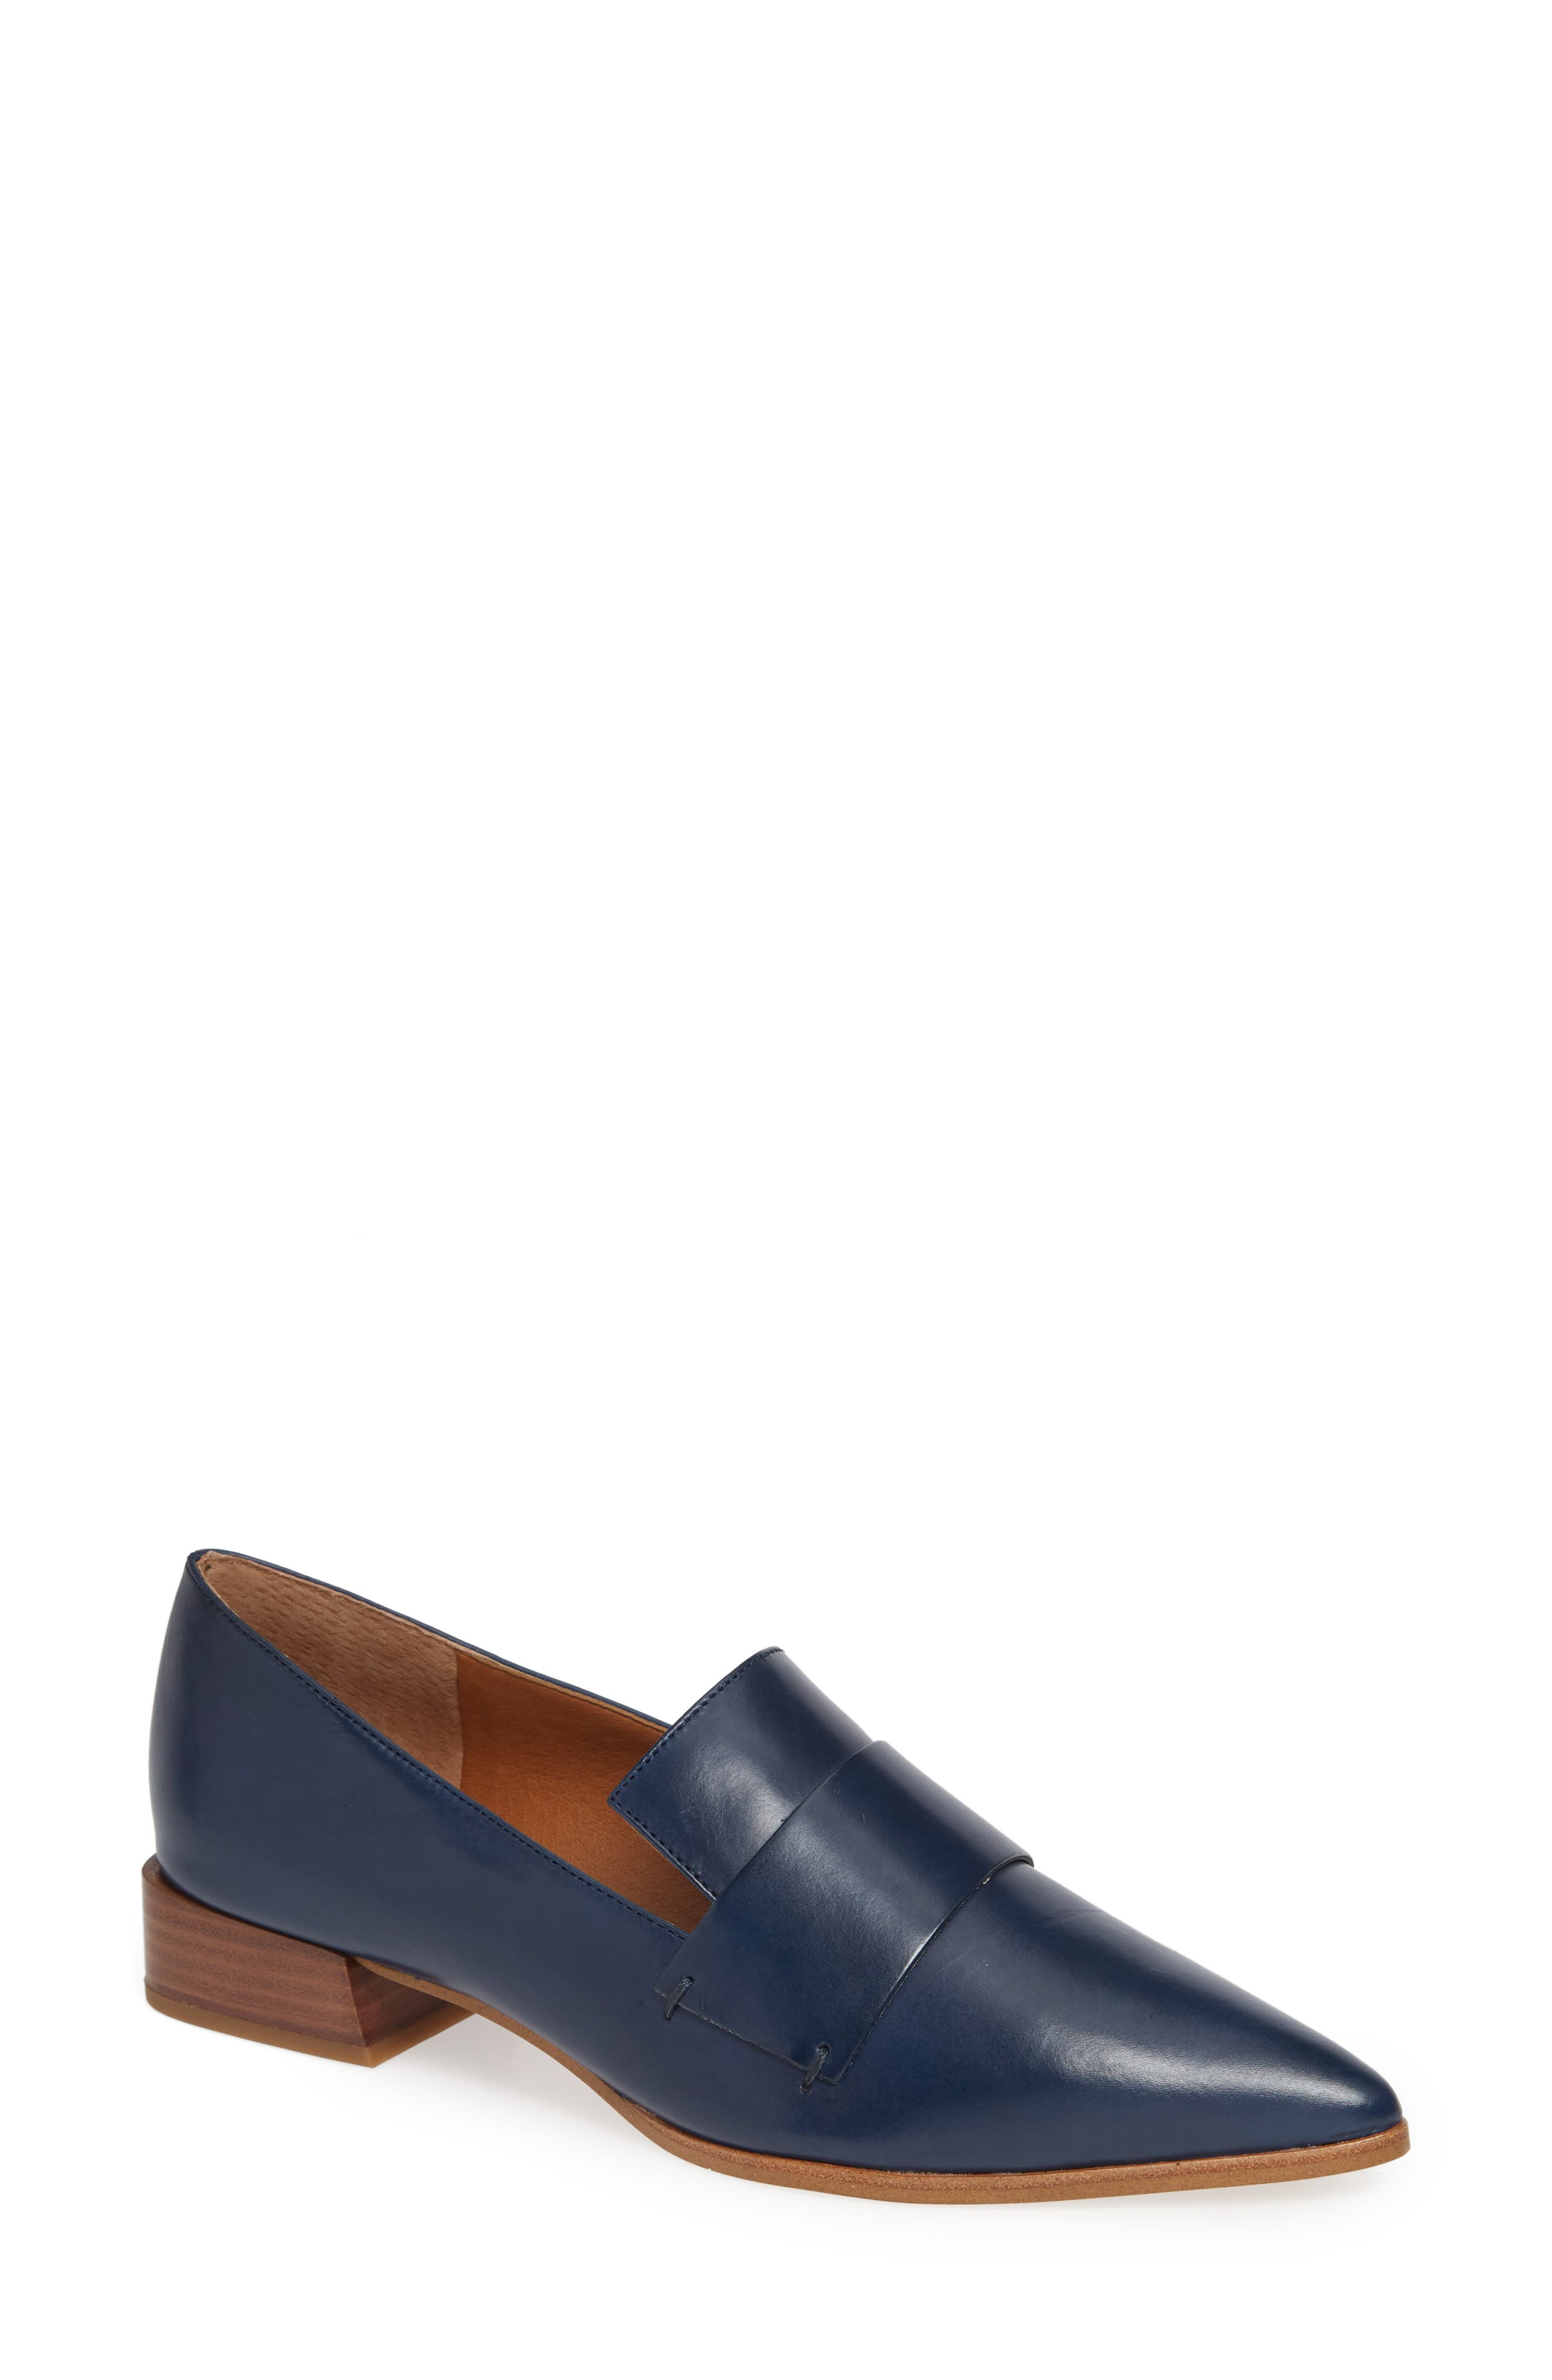 Sarto By Franco Sarto Nebby 2 Pointy Toe Loafer, Blue